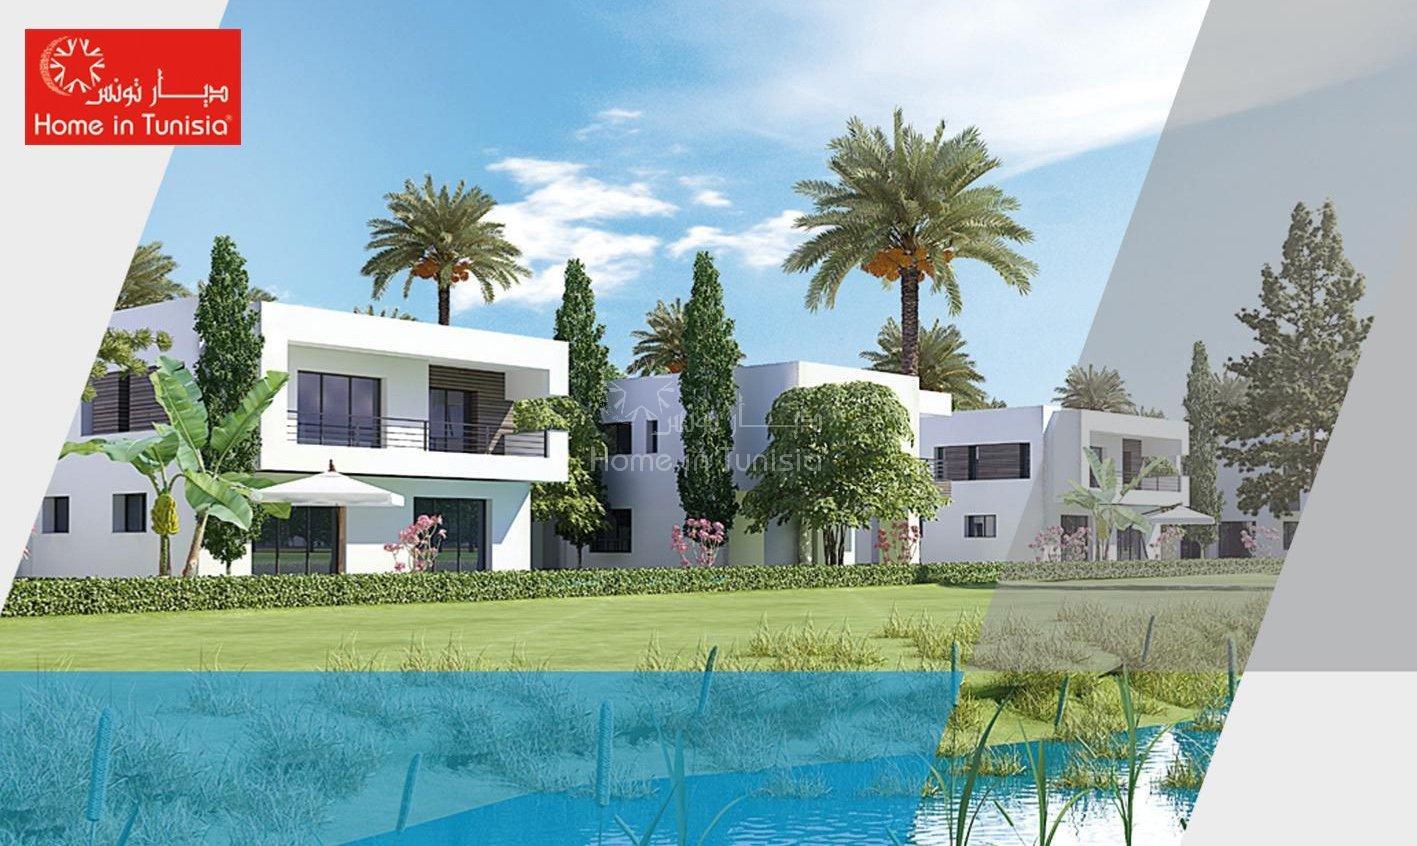 Golf Villa Tunisia Financial Harbor